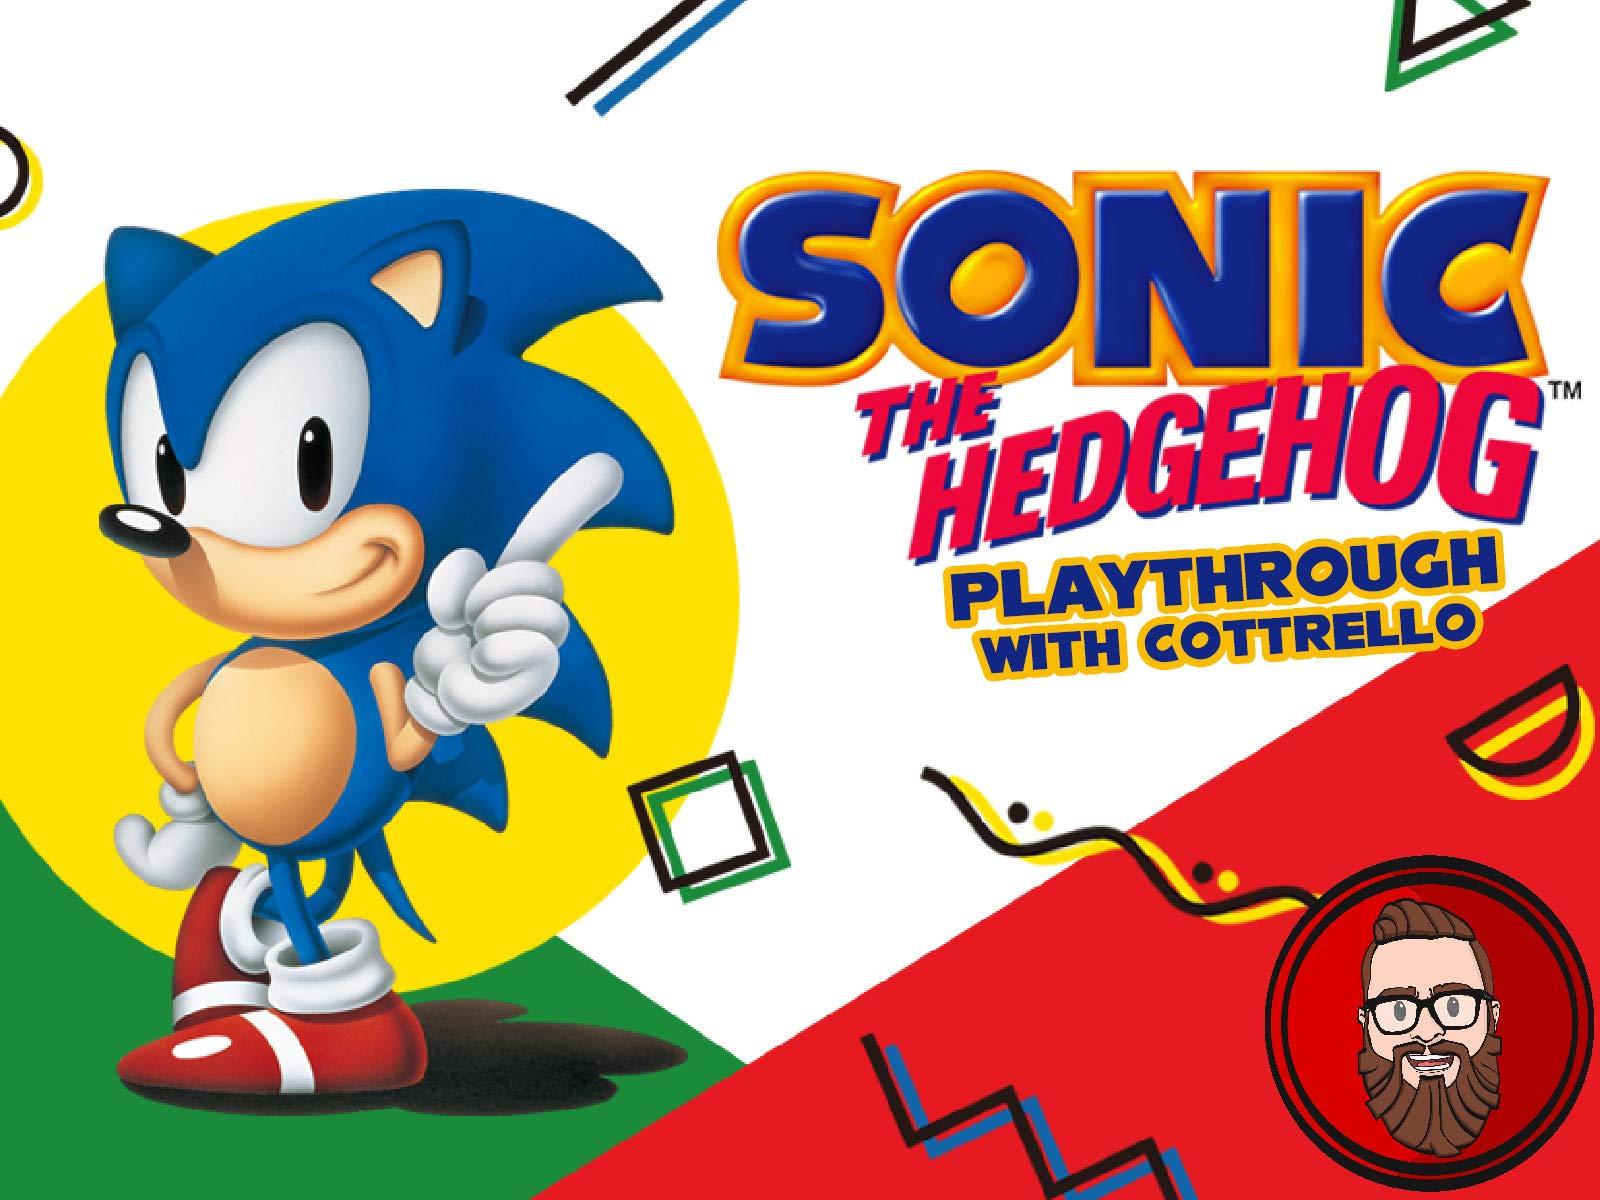 Watch Sonic The Hedgehog Playthrough With Cottrello On Amazon Prime Video Uk Newonamzprimeuk